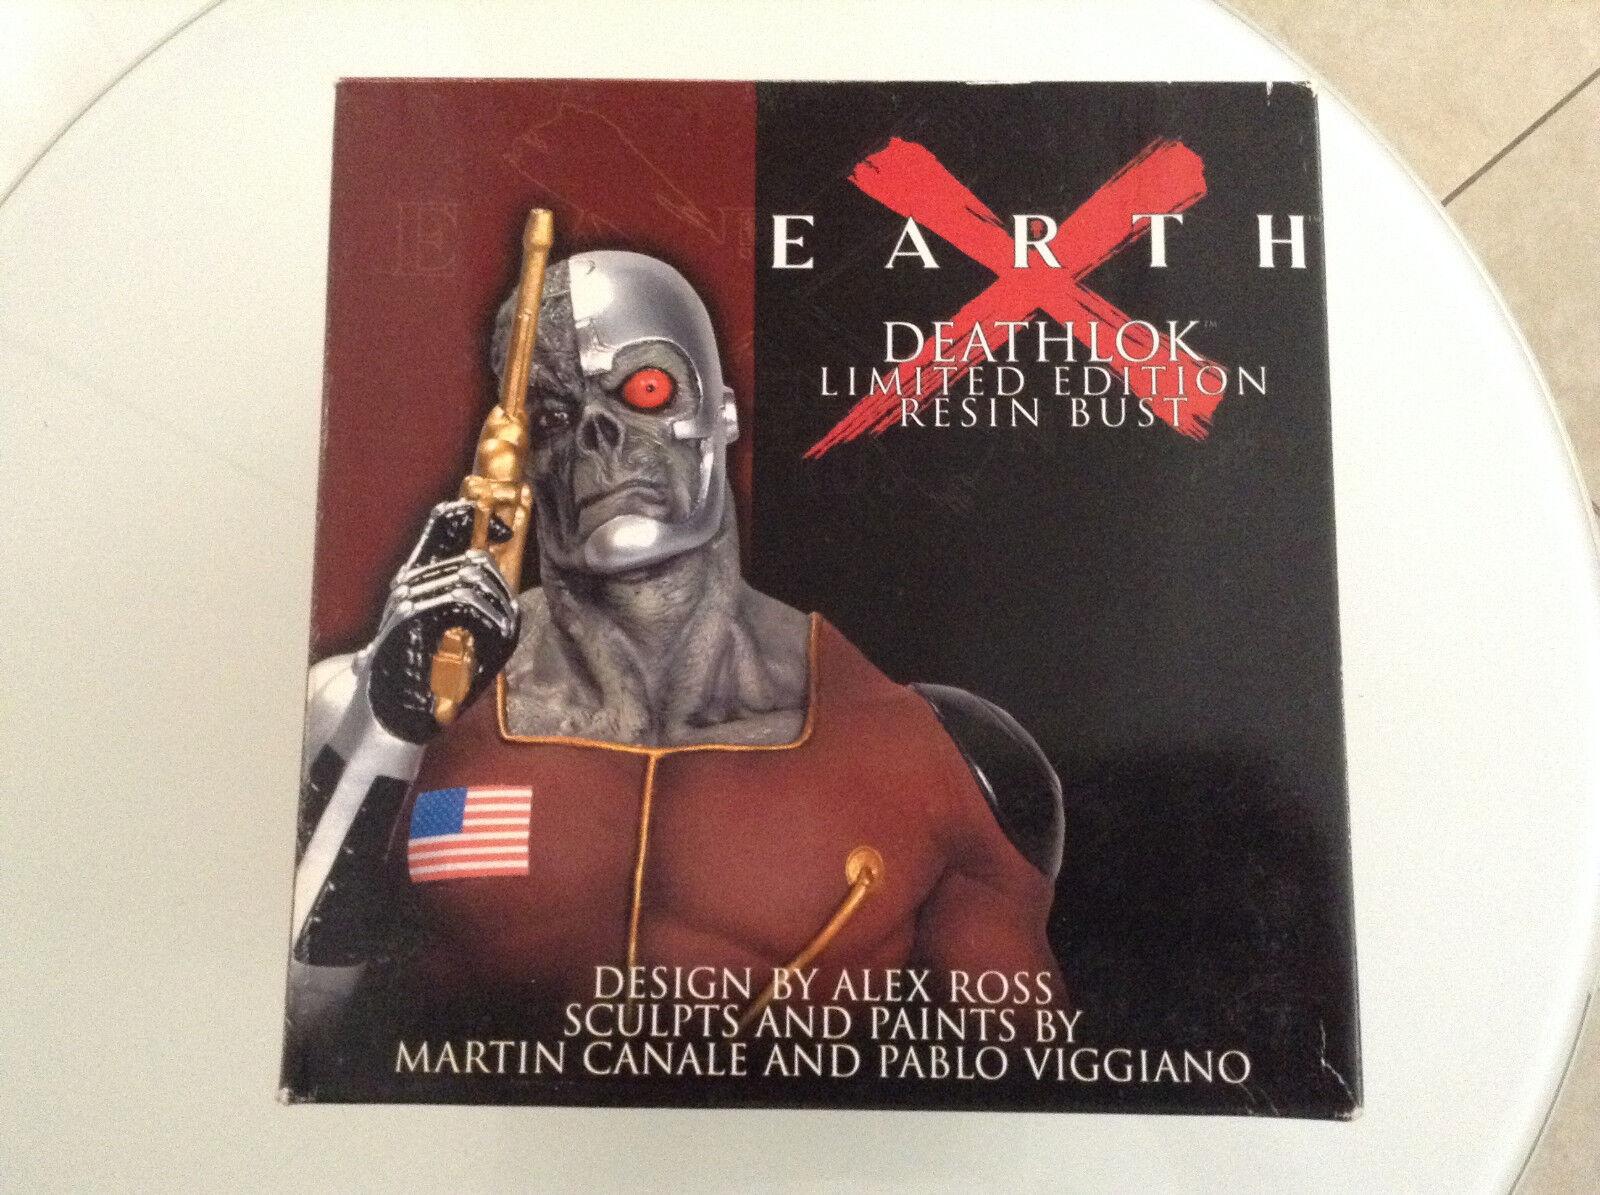 EARTH X DEATHLOK BUST 1669 3000 NEW ALEX ROSS DYNAMIC FORCES MARVEL AVENGERS 123